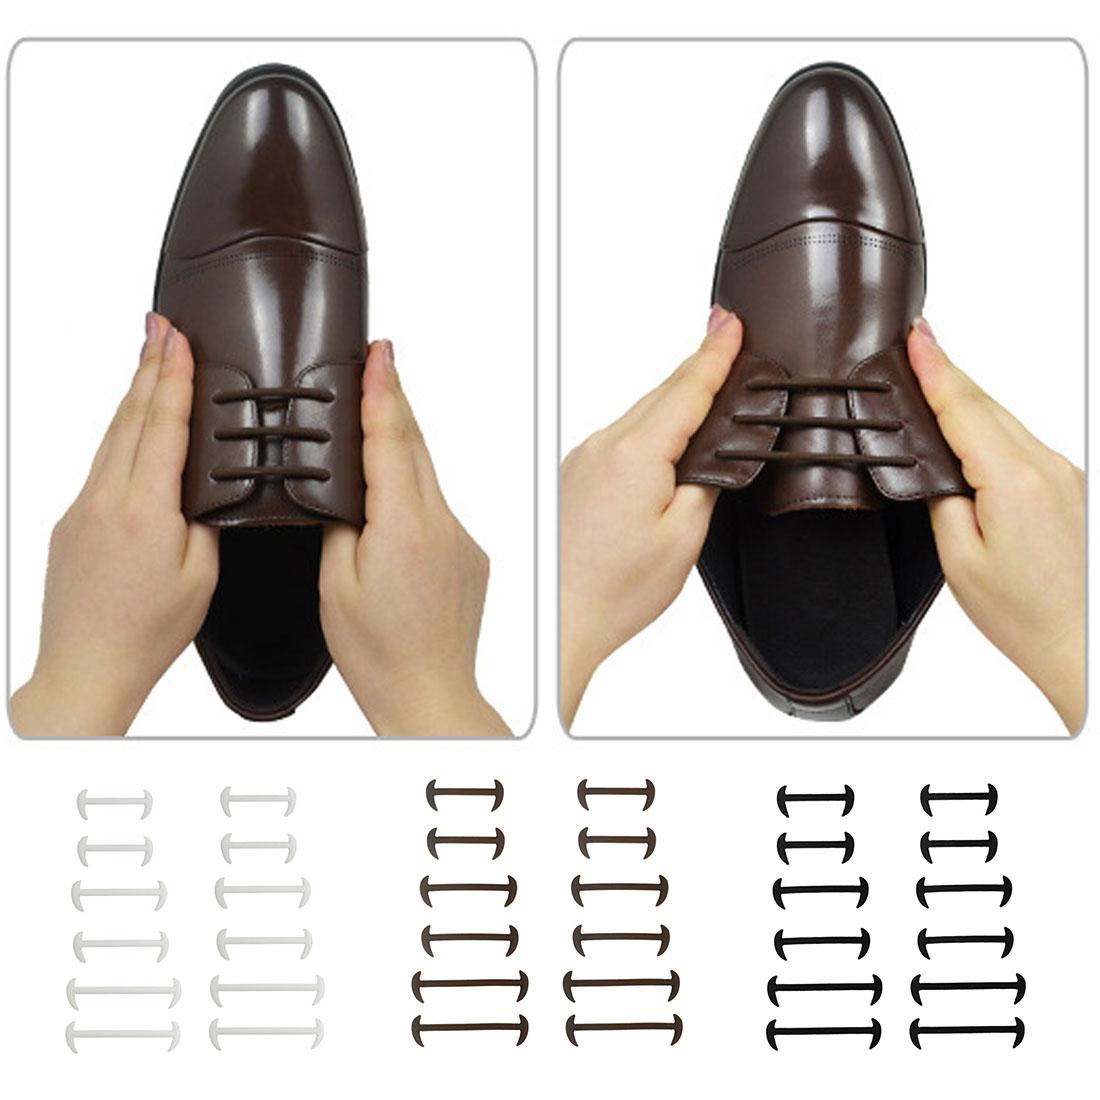 12x No Tie Elastic Kids Adults Shoe Laces Oxford Round Dress Shoelaces Cord